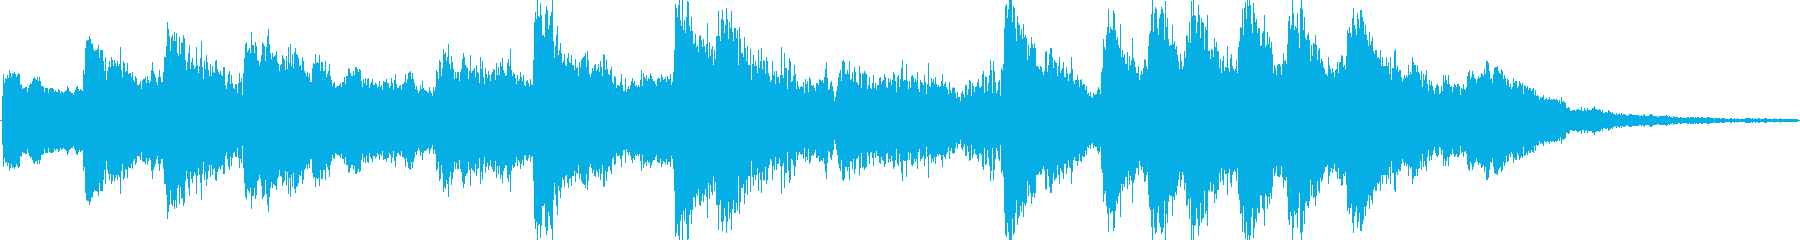 SpychoなFXとロンリーなピアノの再生済みの波形